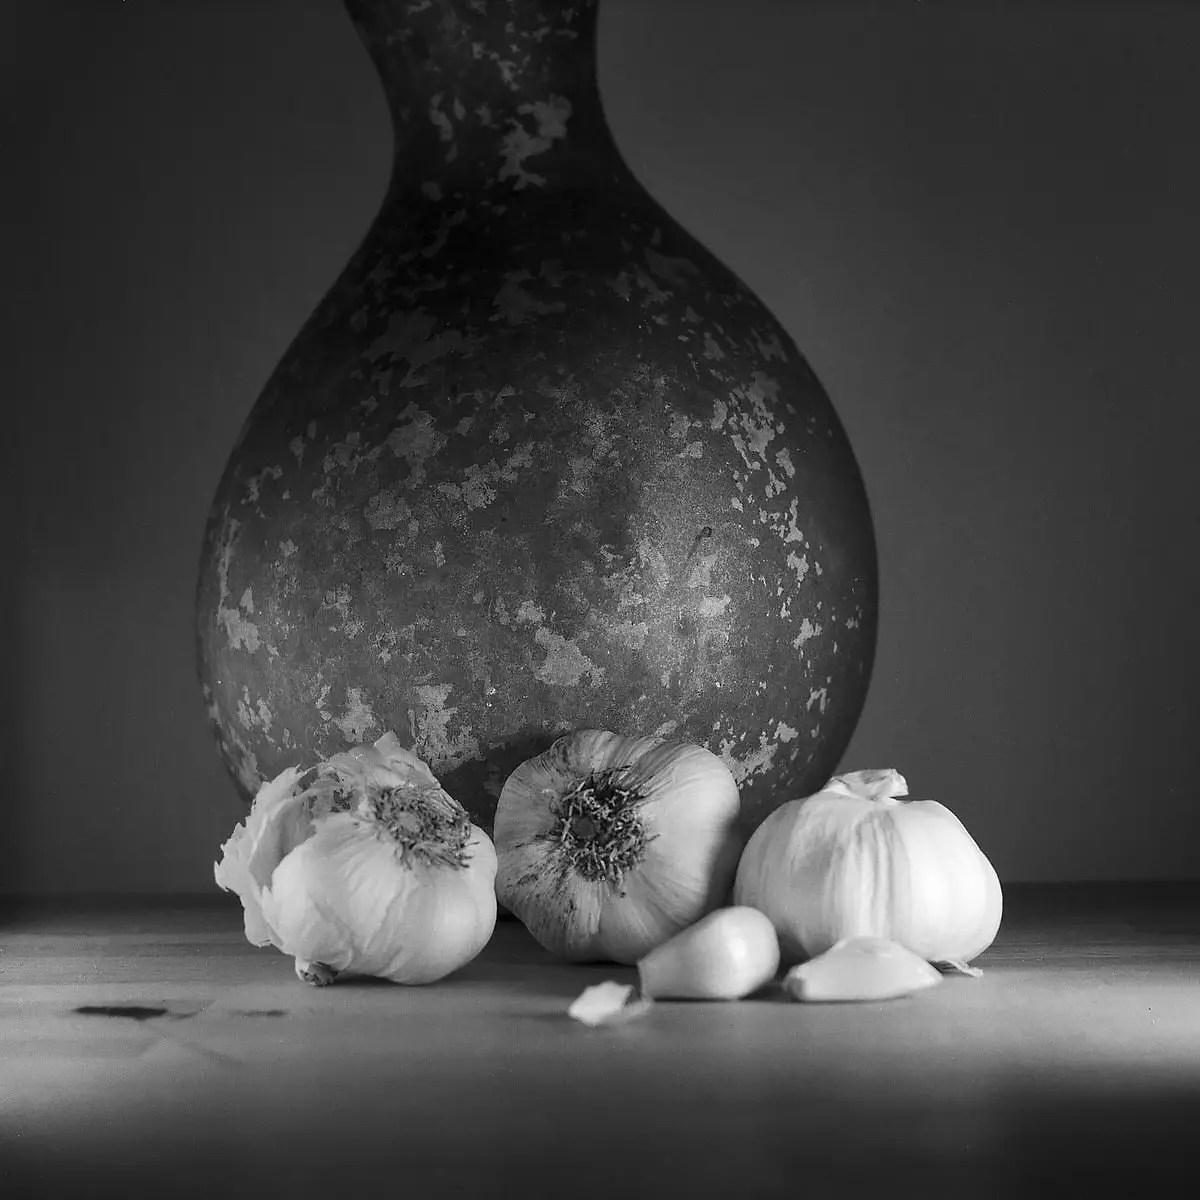 Garlic – Still Life Photography - Yashica MAT-124 with Fomapan 200 Creative